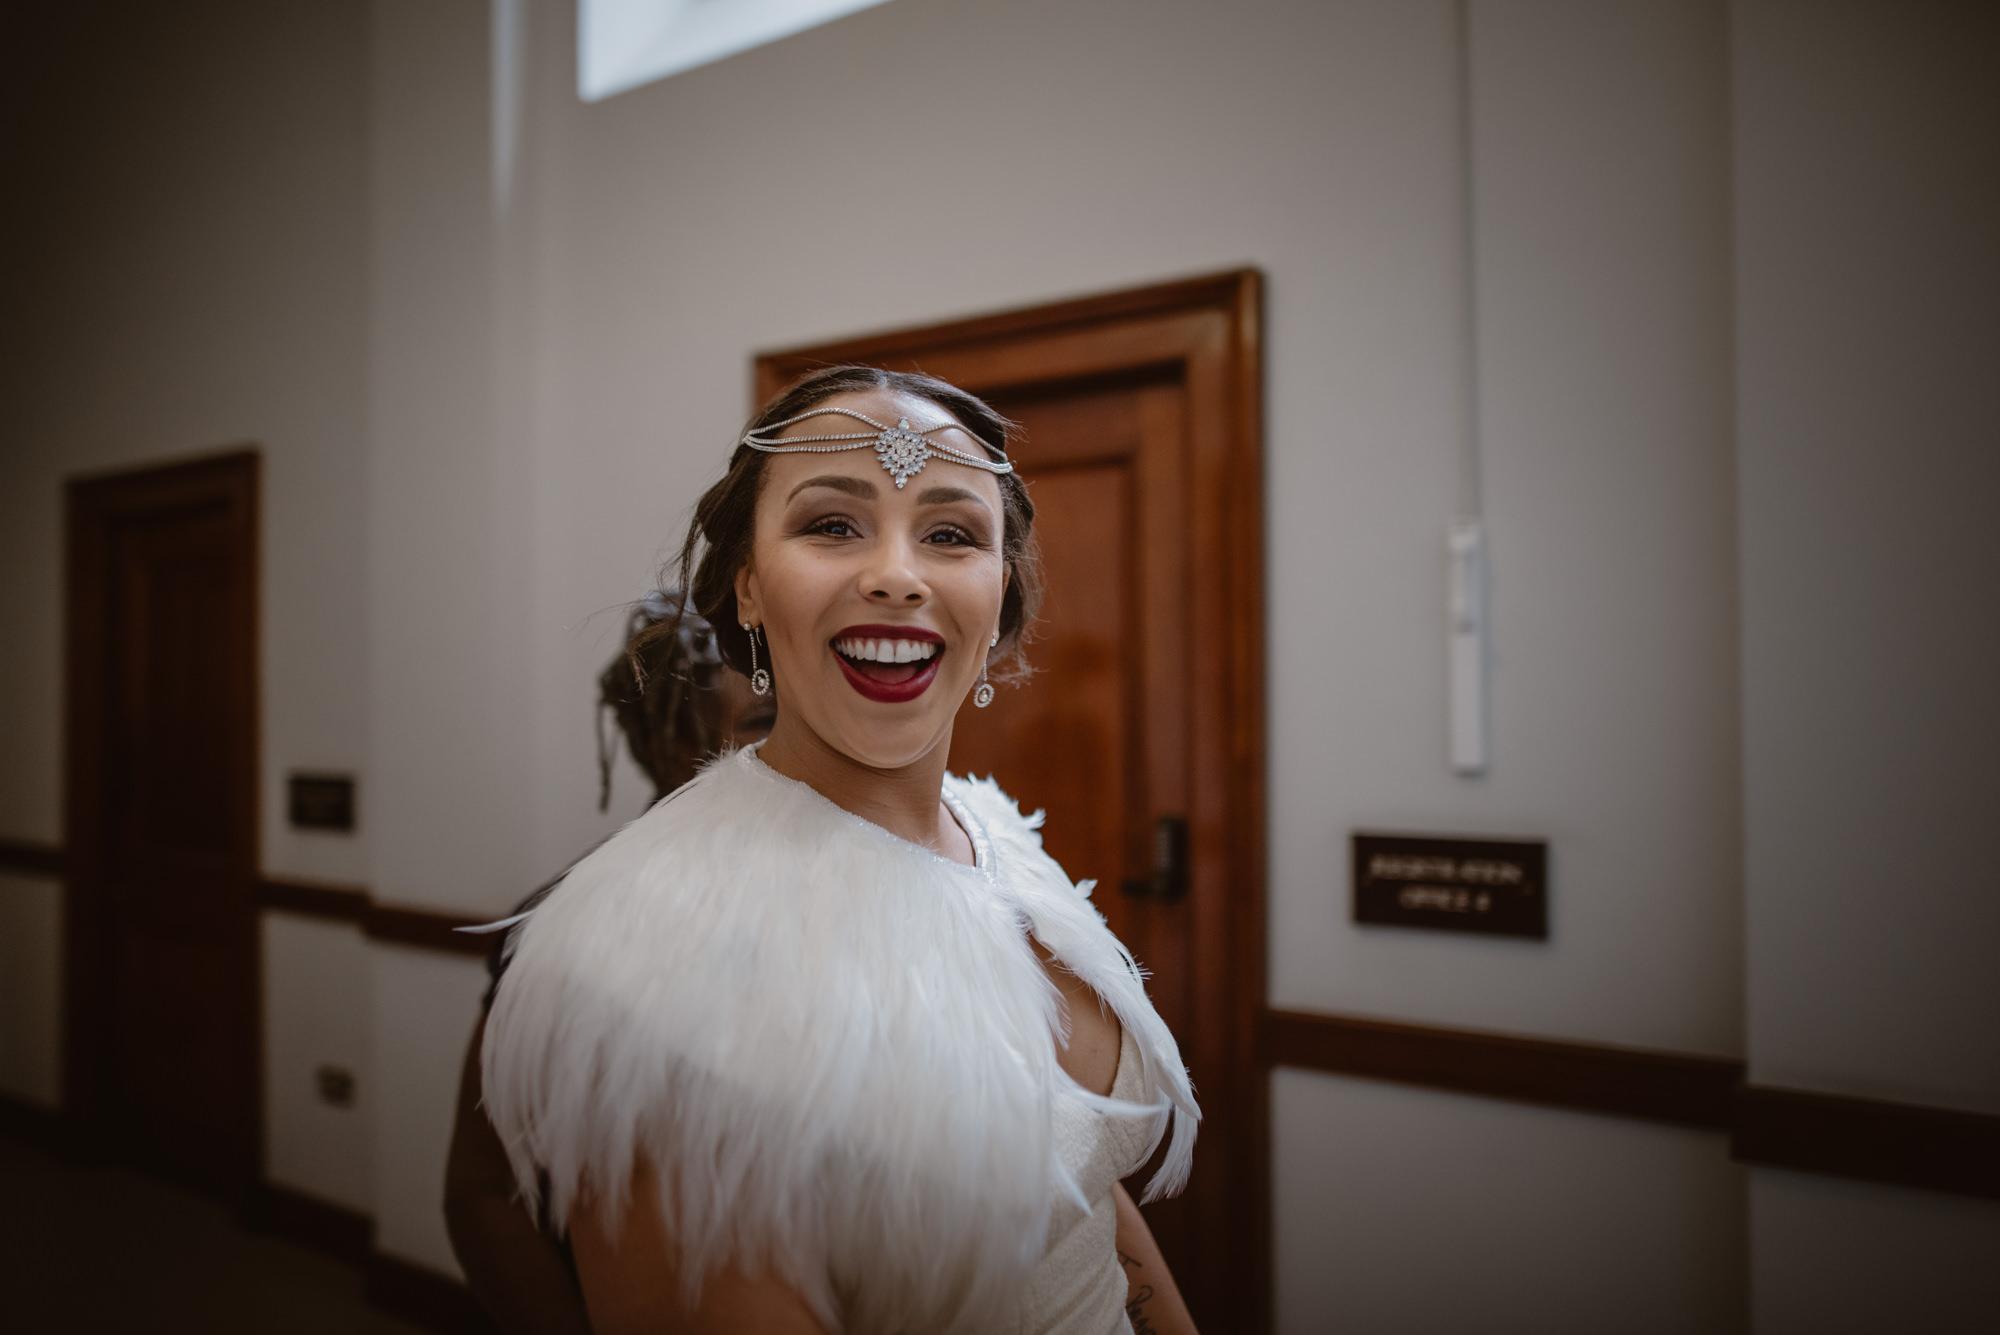 Jacqueline-Gareth-Wedding-Westmead-Events-Surrey-Manu-Mendoza-Wedding-Photography-024.jpg